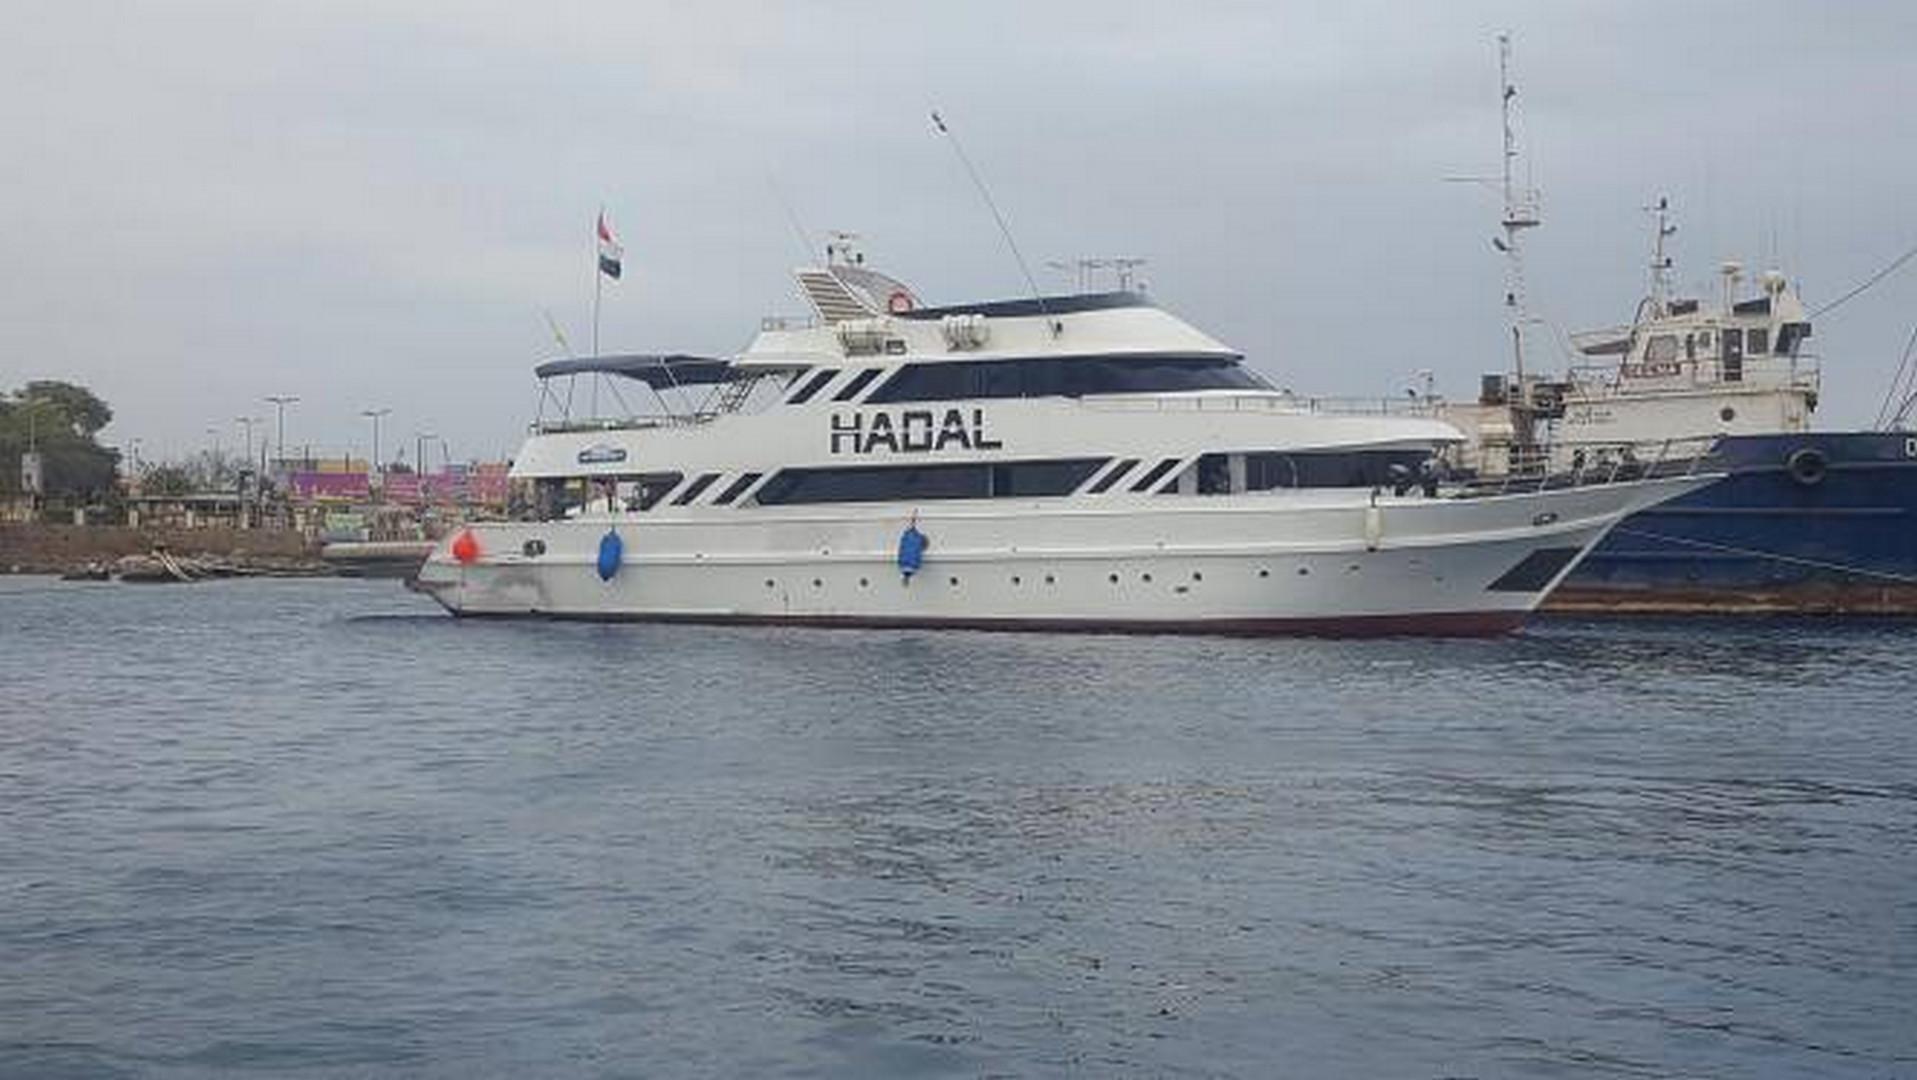 HADAL-015